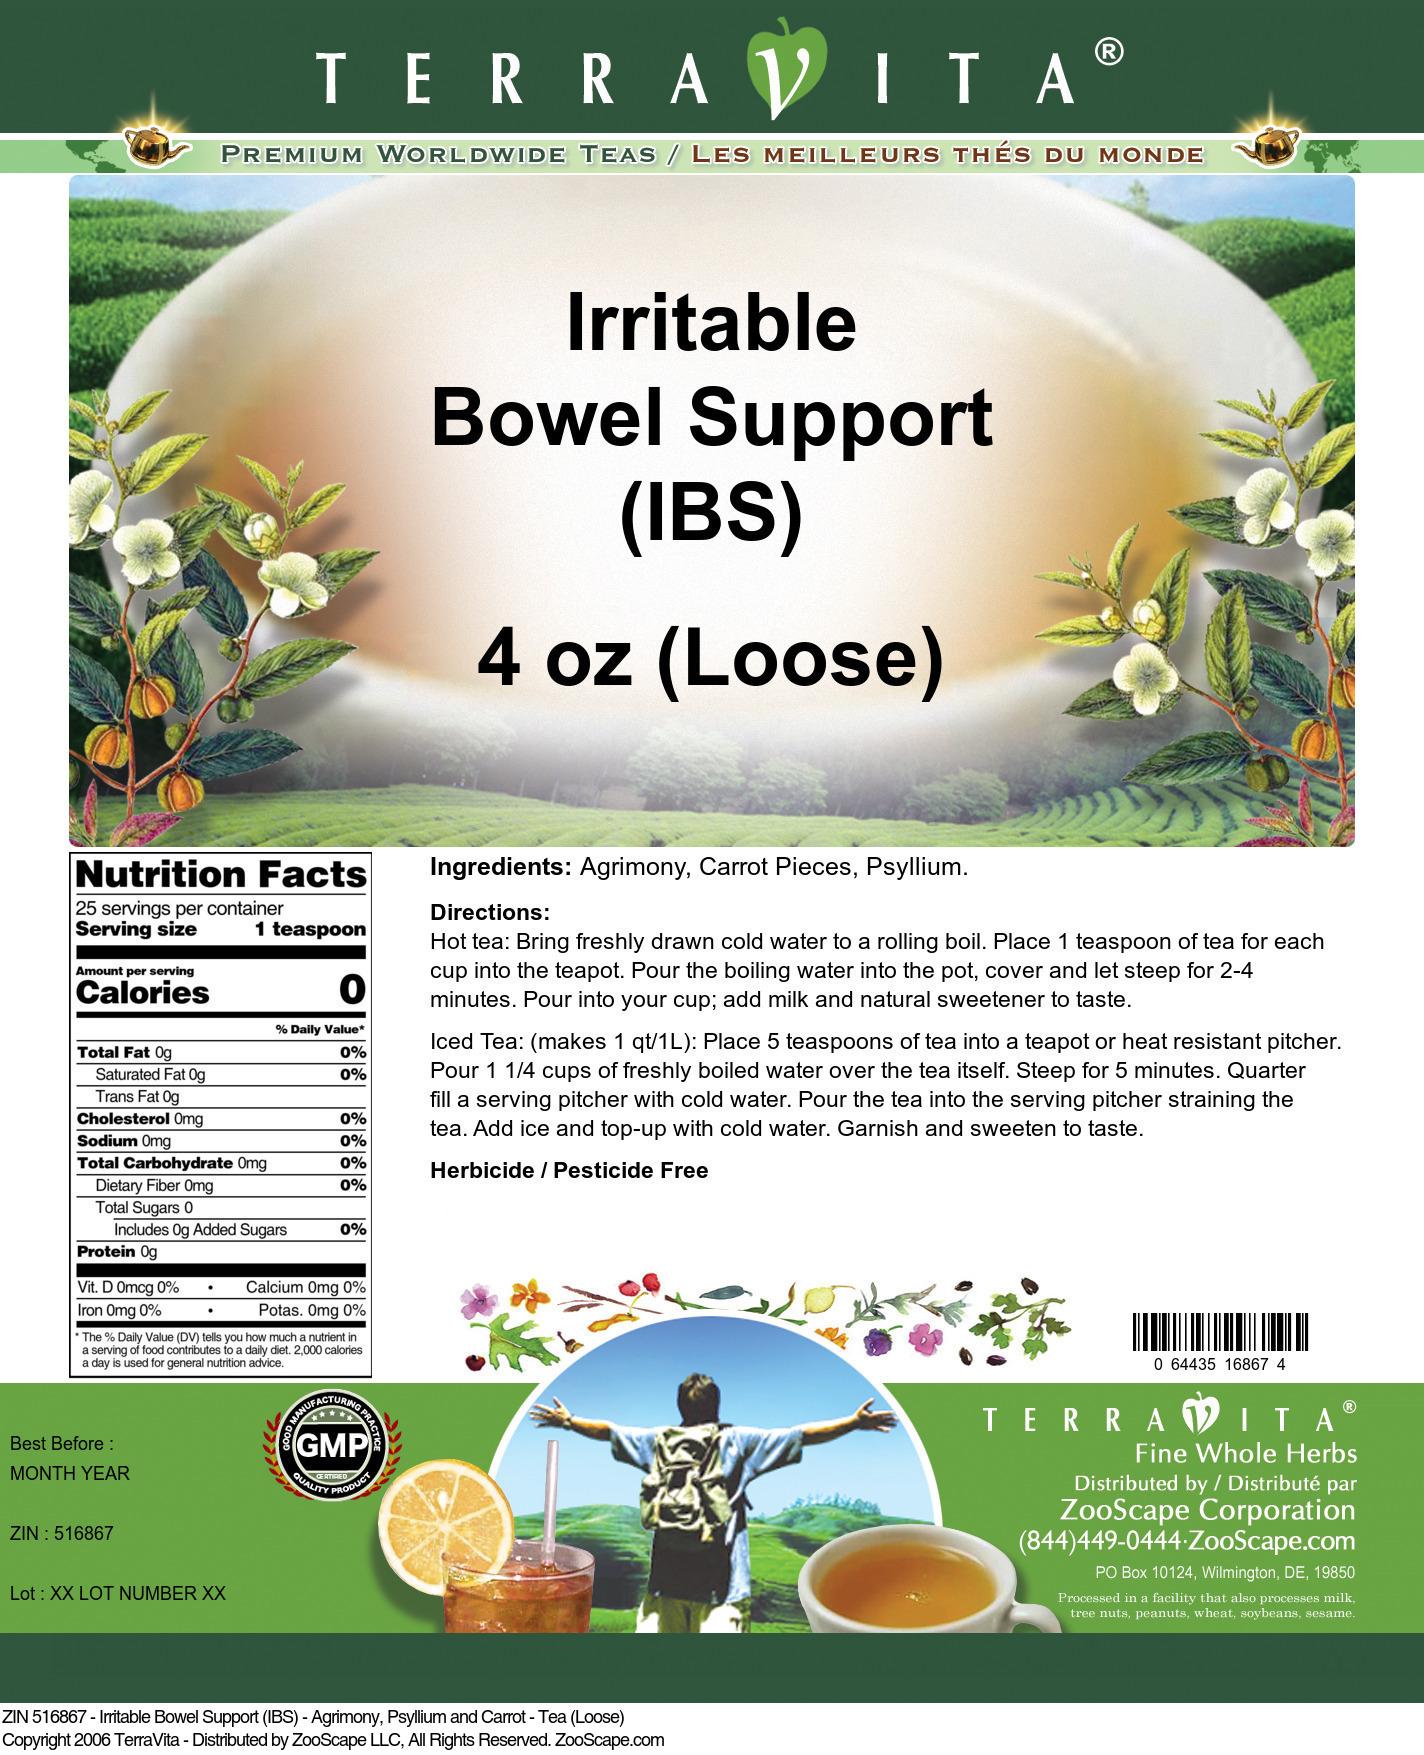 Irritable Bowel Support